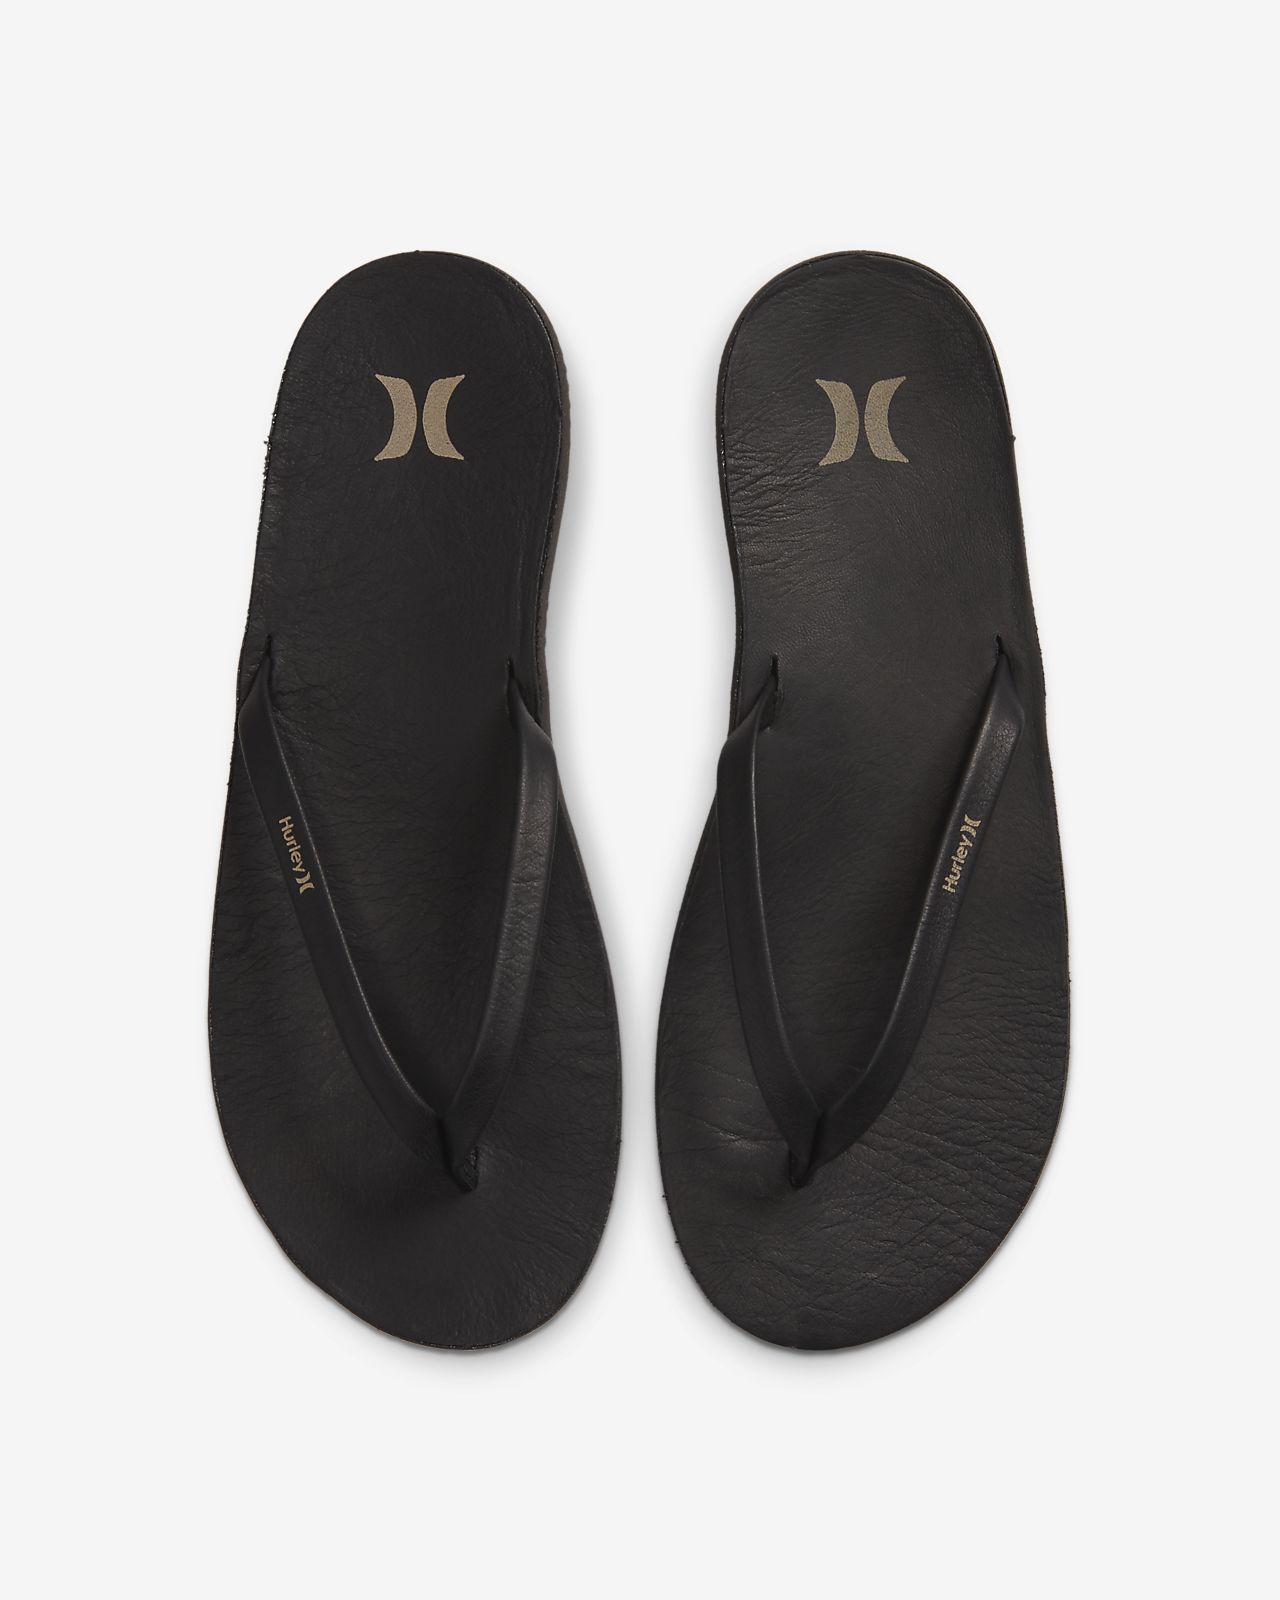 Hurley Lunar Women's Sandals